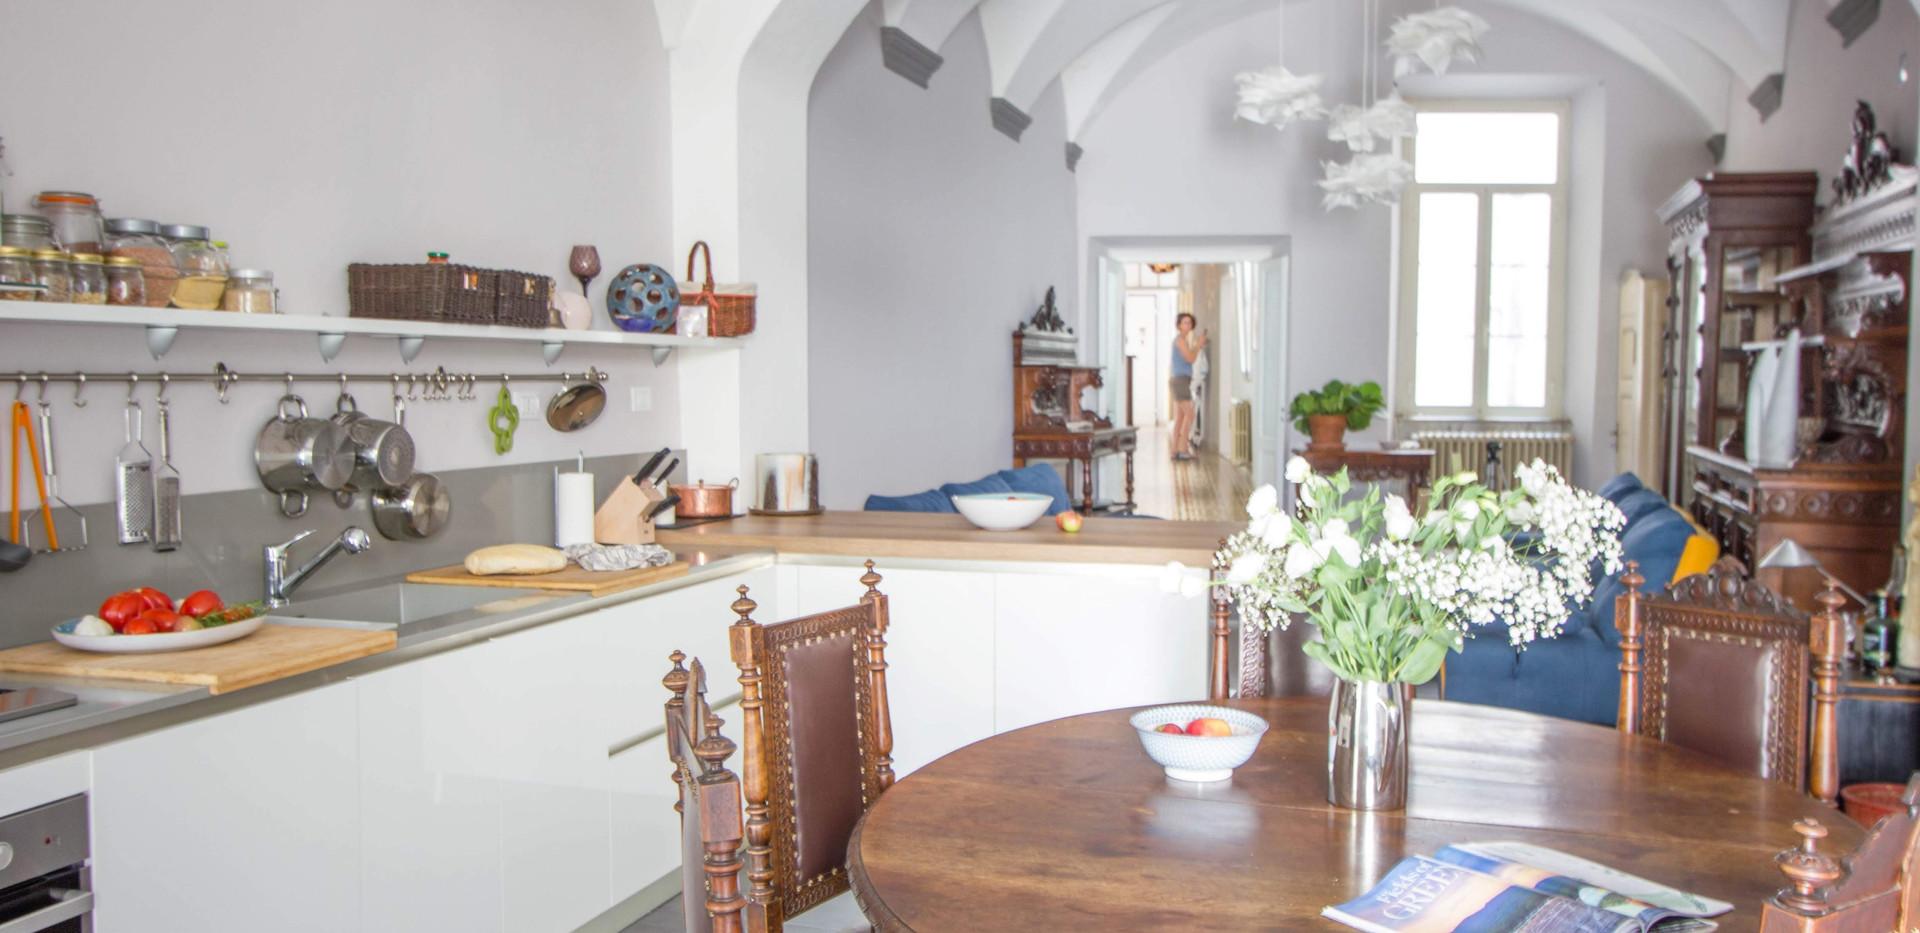 Lo scultore - Pontremoli - Kitchen3.jpg